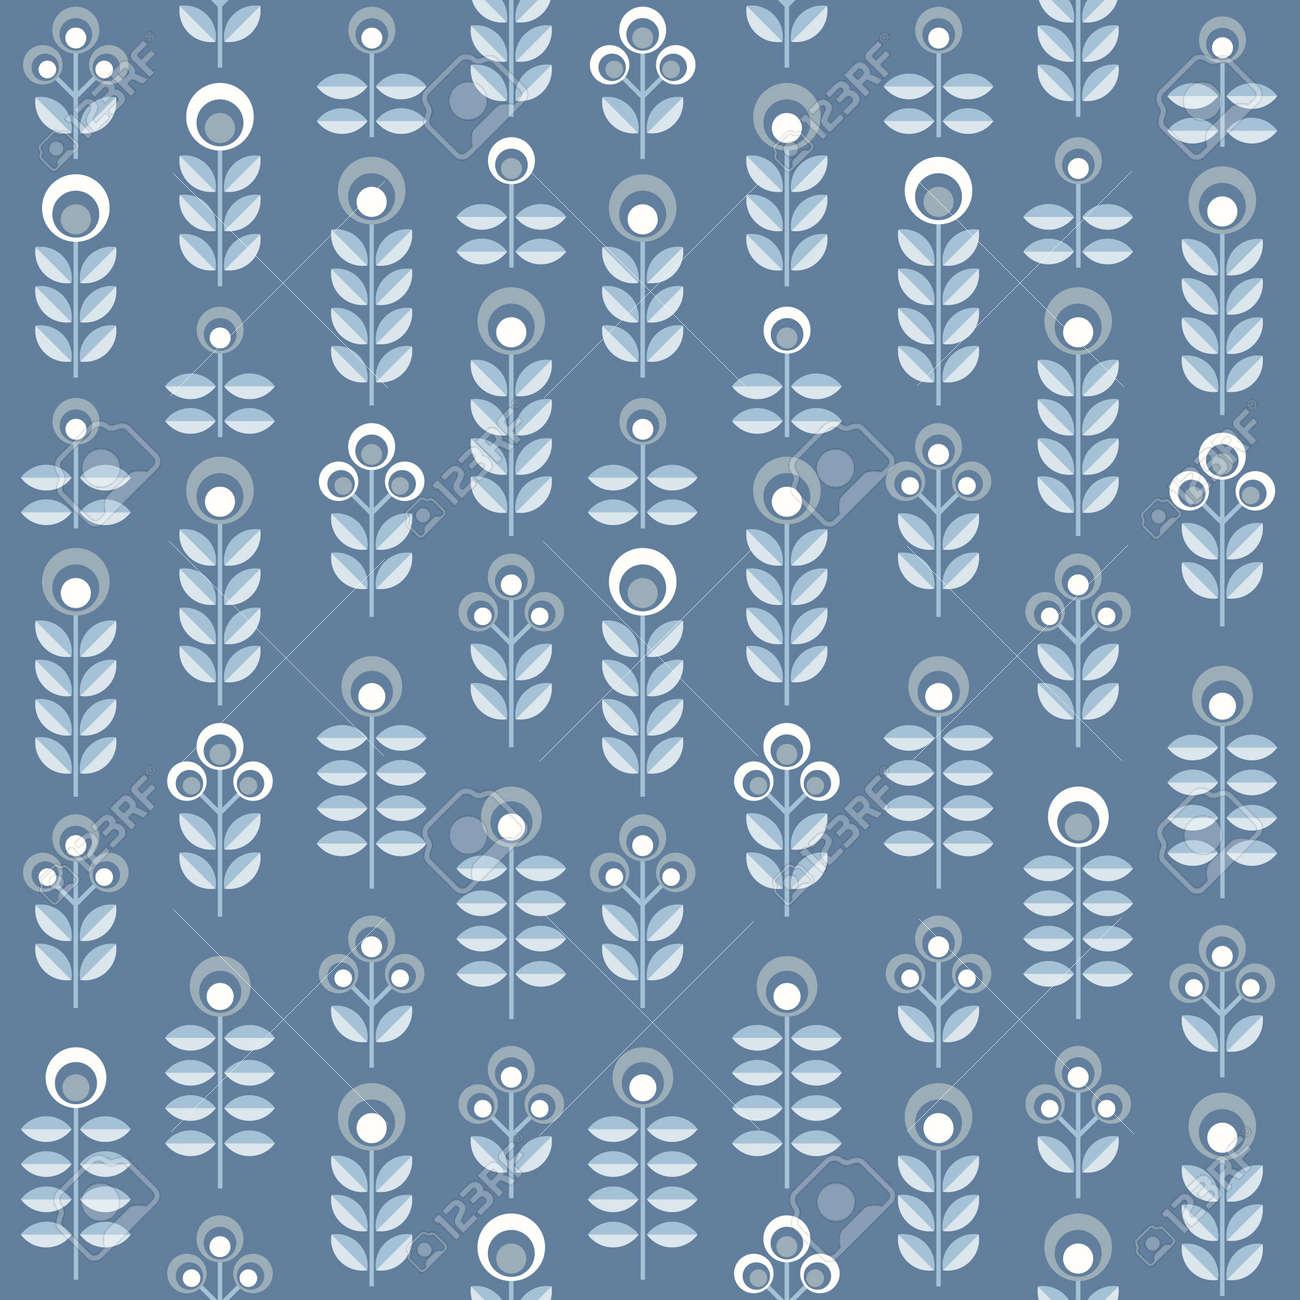 Scandinavian Floral Background Mid Century Wallpaper Seamless Pattern Vector Illustration Retro Interior